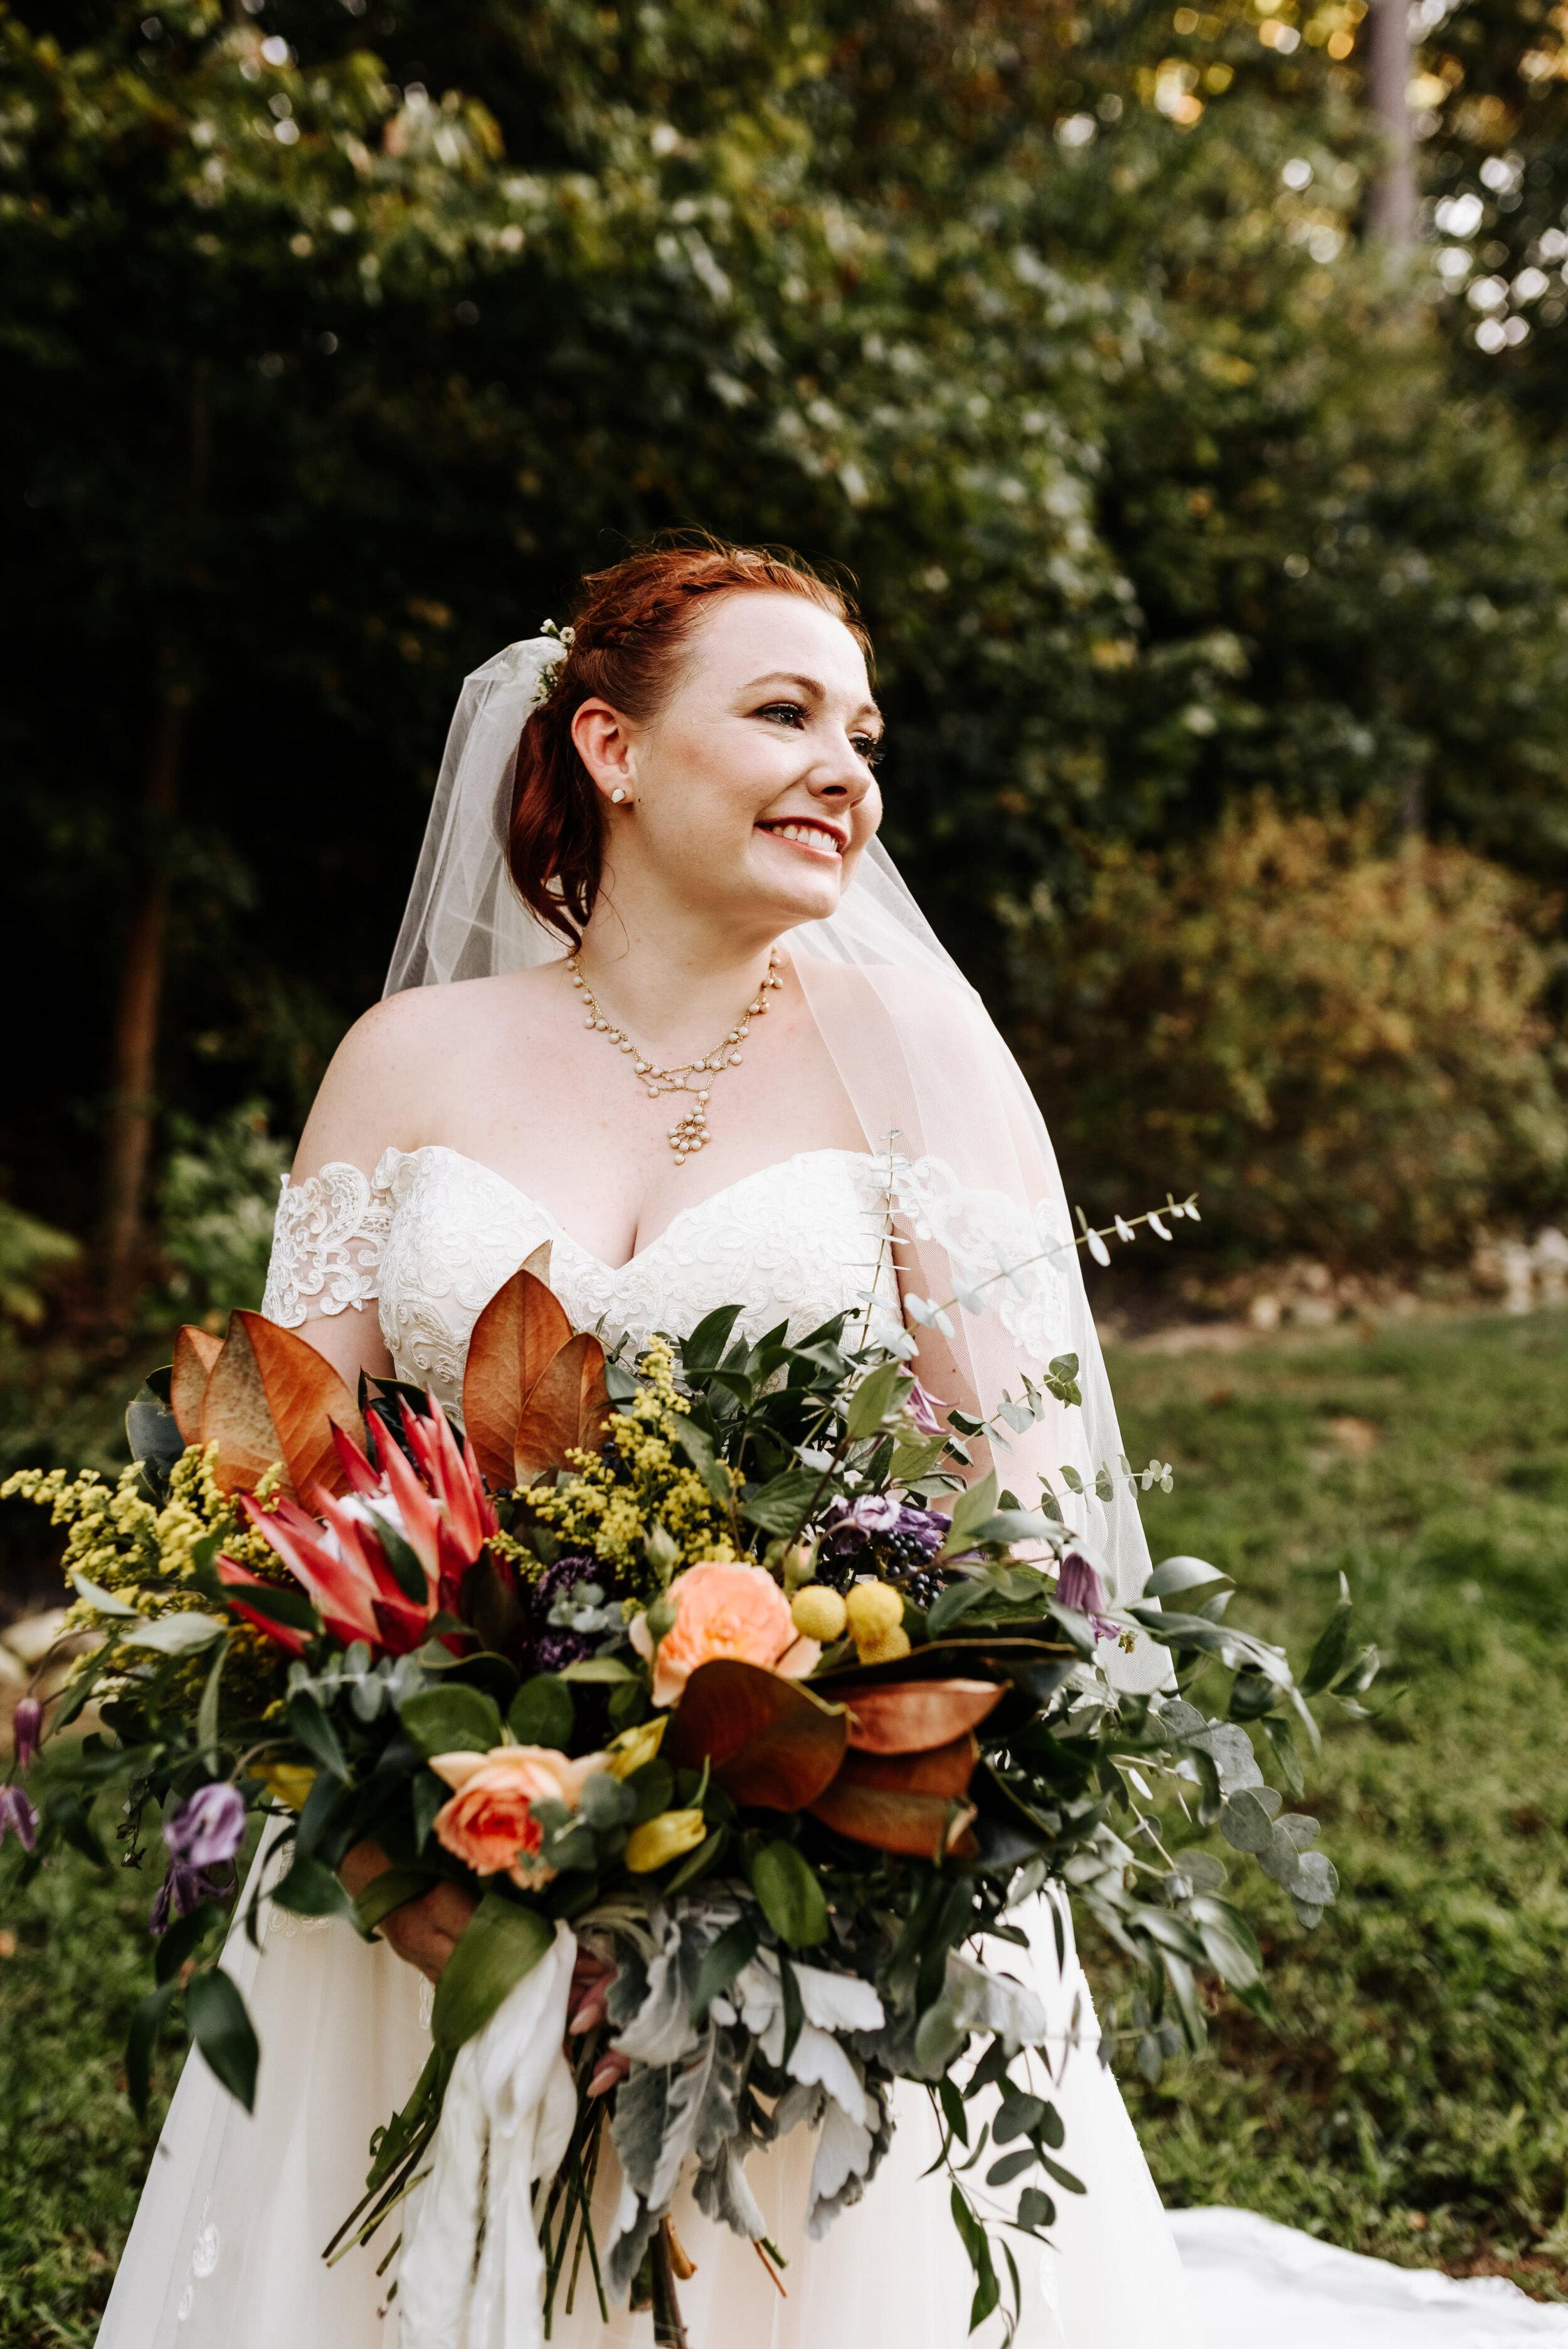 Rachel_David_Wedding_Richmond_Virginia_Photography_by_V_50.jpg